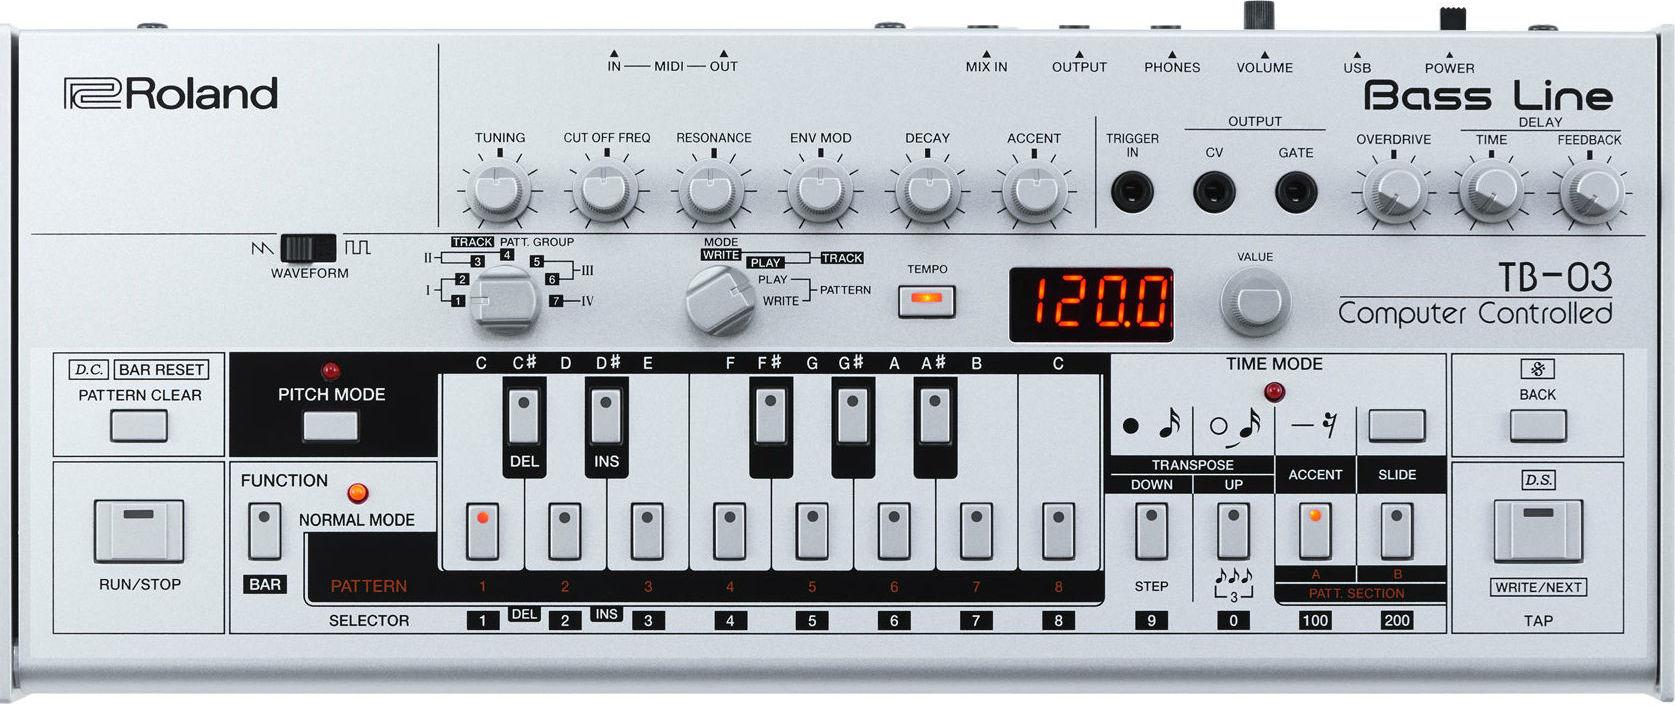 Синтезатор Roland TB-03